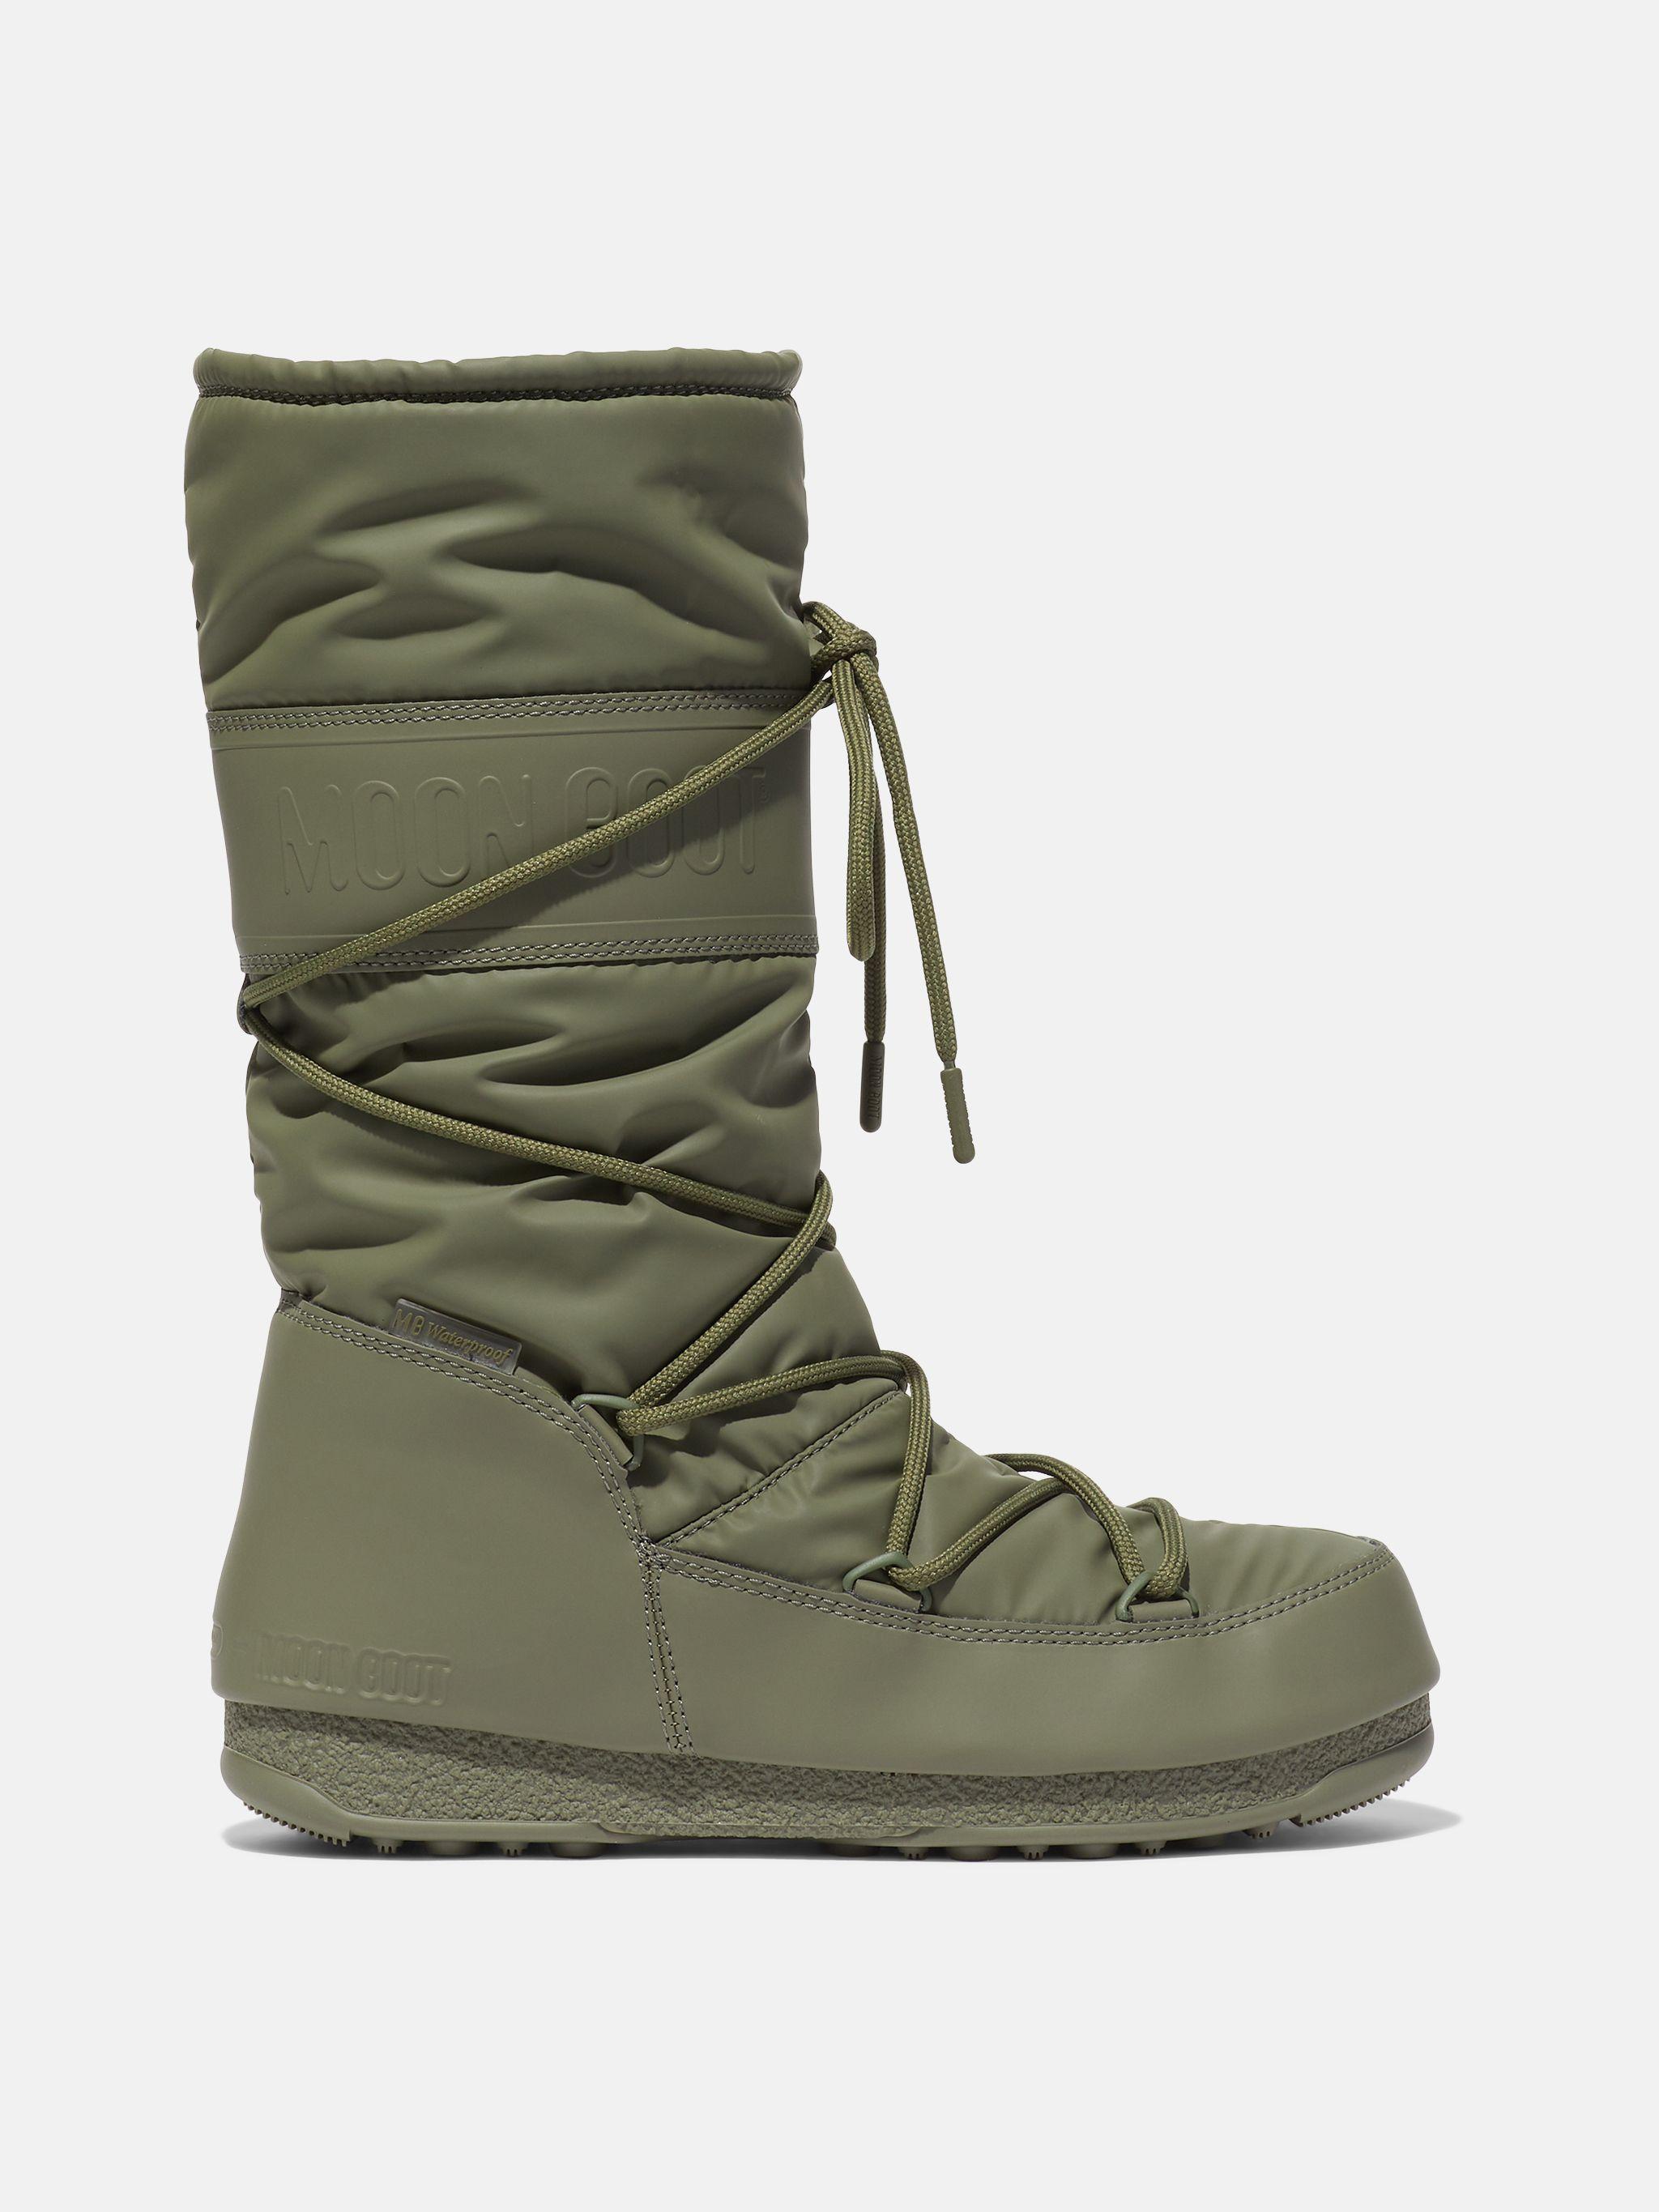 PROTECHT HI-TOP KHAKI RUBBER BOOTS